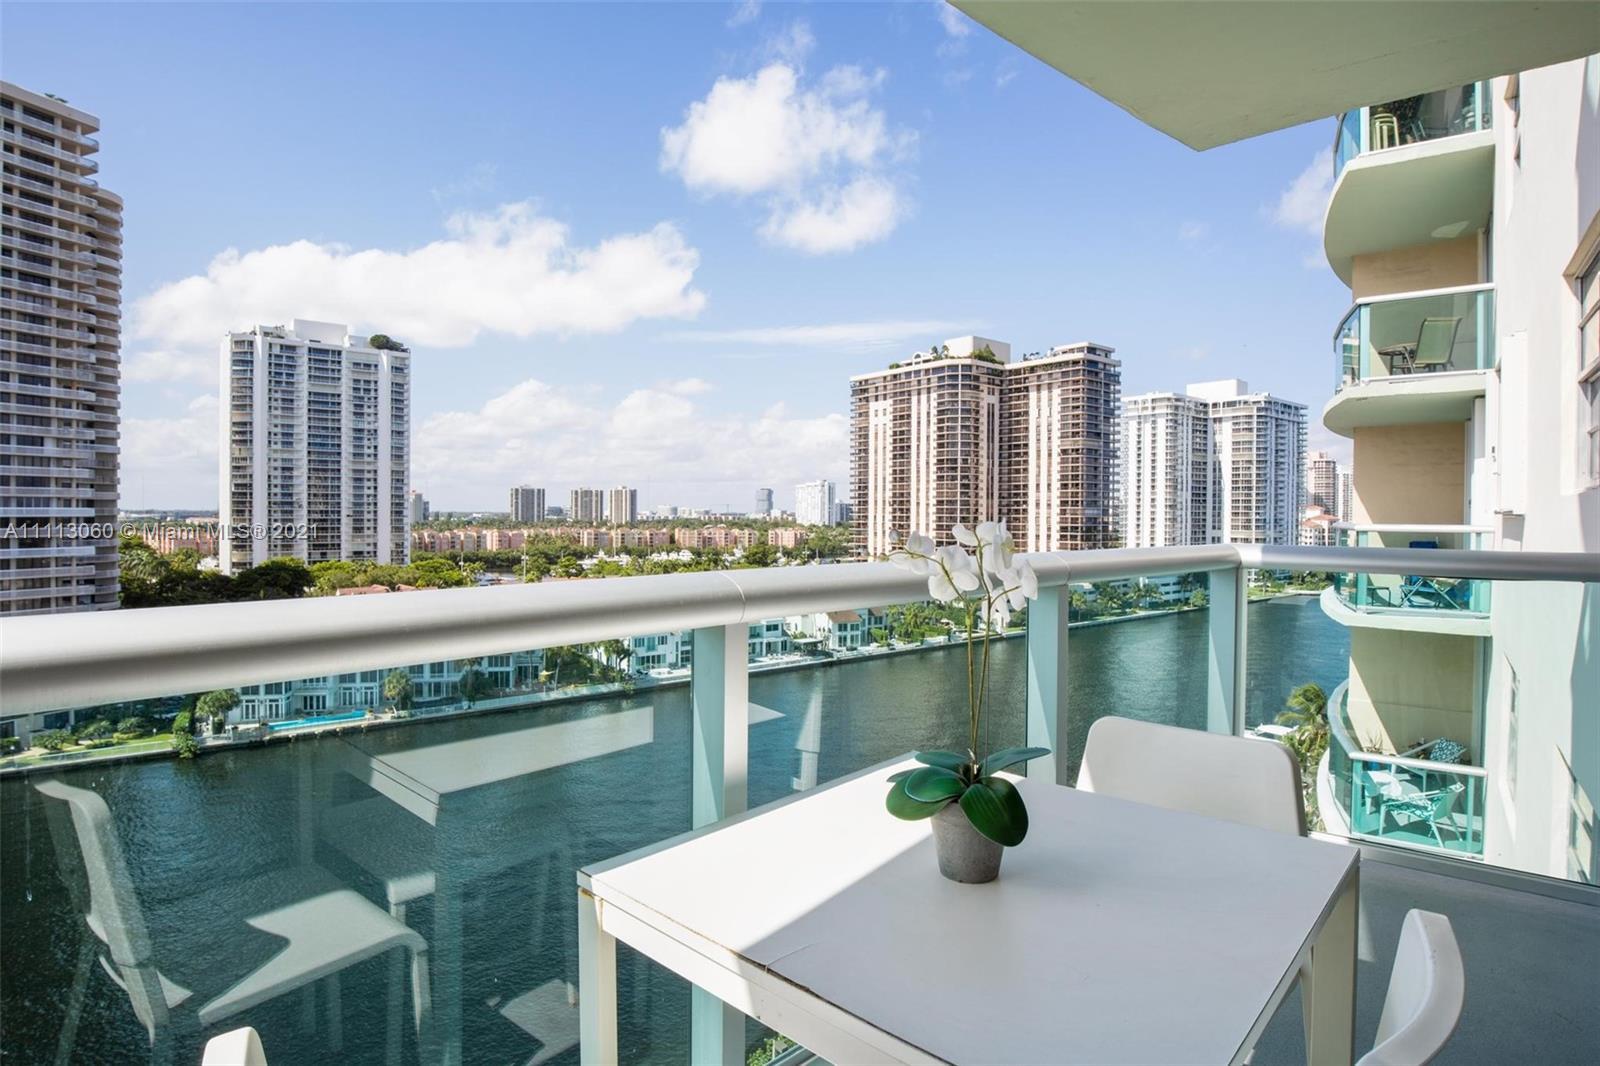 Ocean View A #1123 - 19390 Collins Ave #1123, Sunny Isles Beach, FL 33160